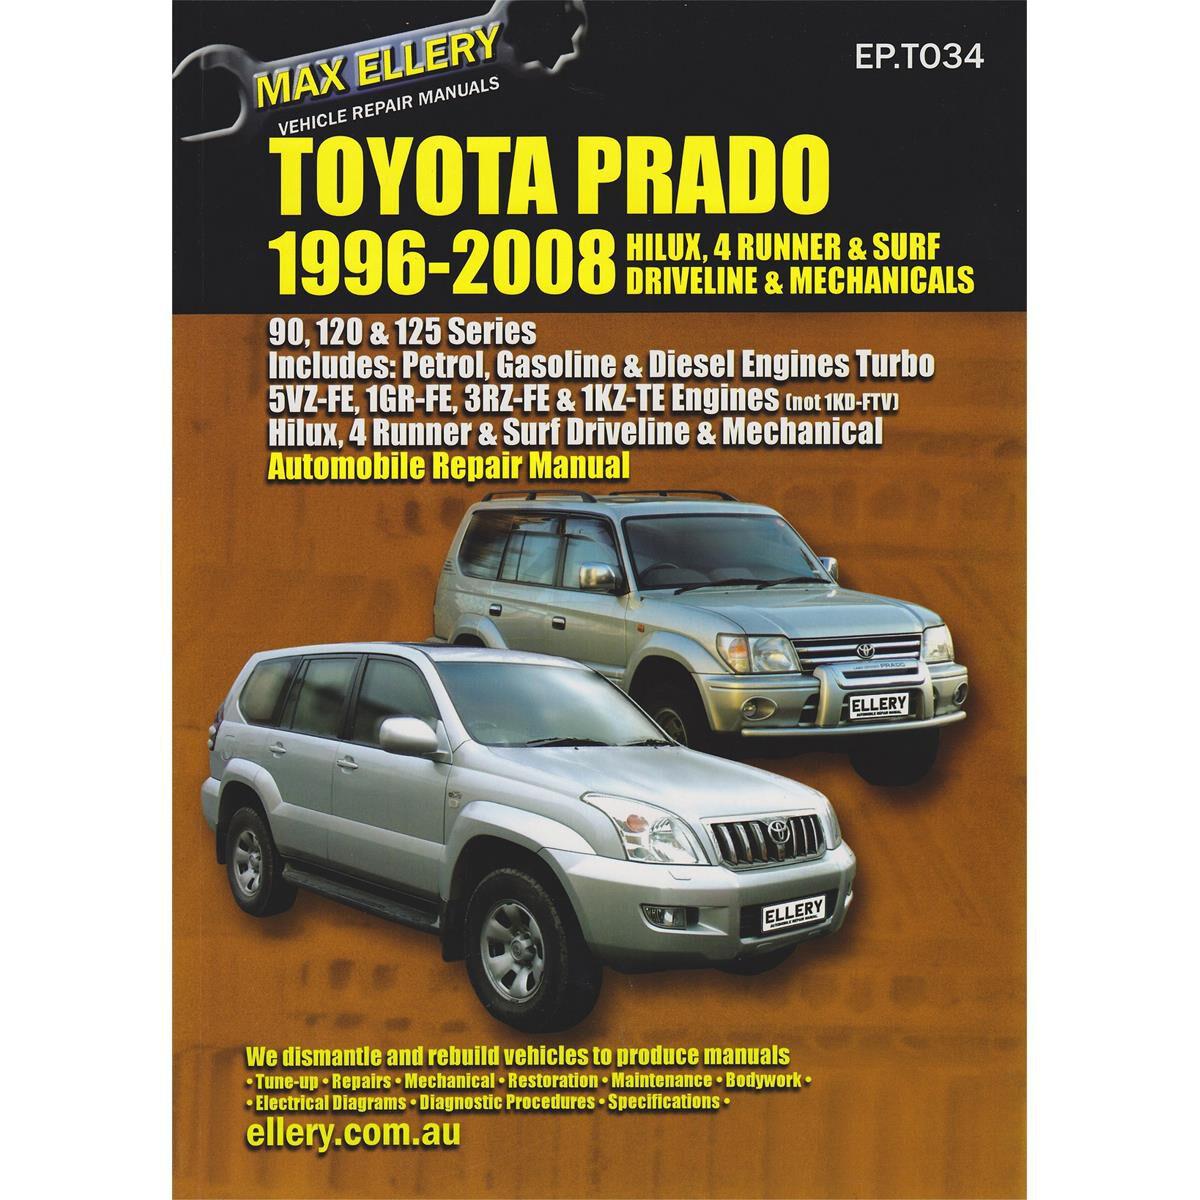 car manual for toyota prado 1996 2008 ep t034 supercheap auto rh supercheapauto com au 2008 hilux repair manual 2008 hilux repair manual